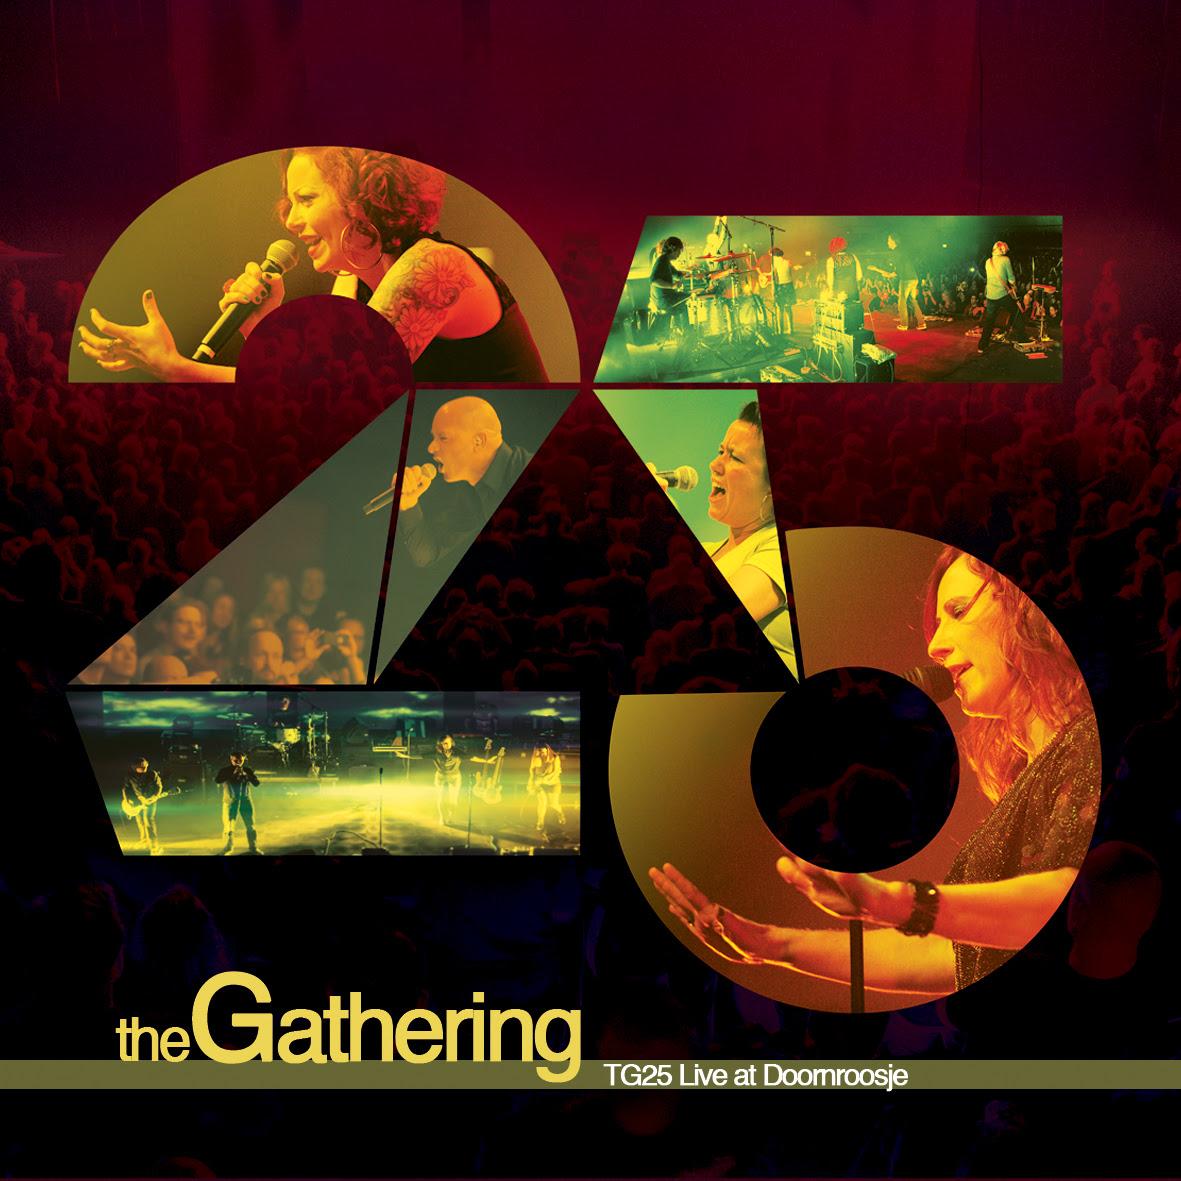 gathering tg25